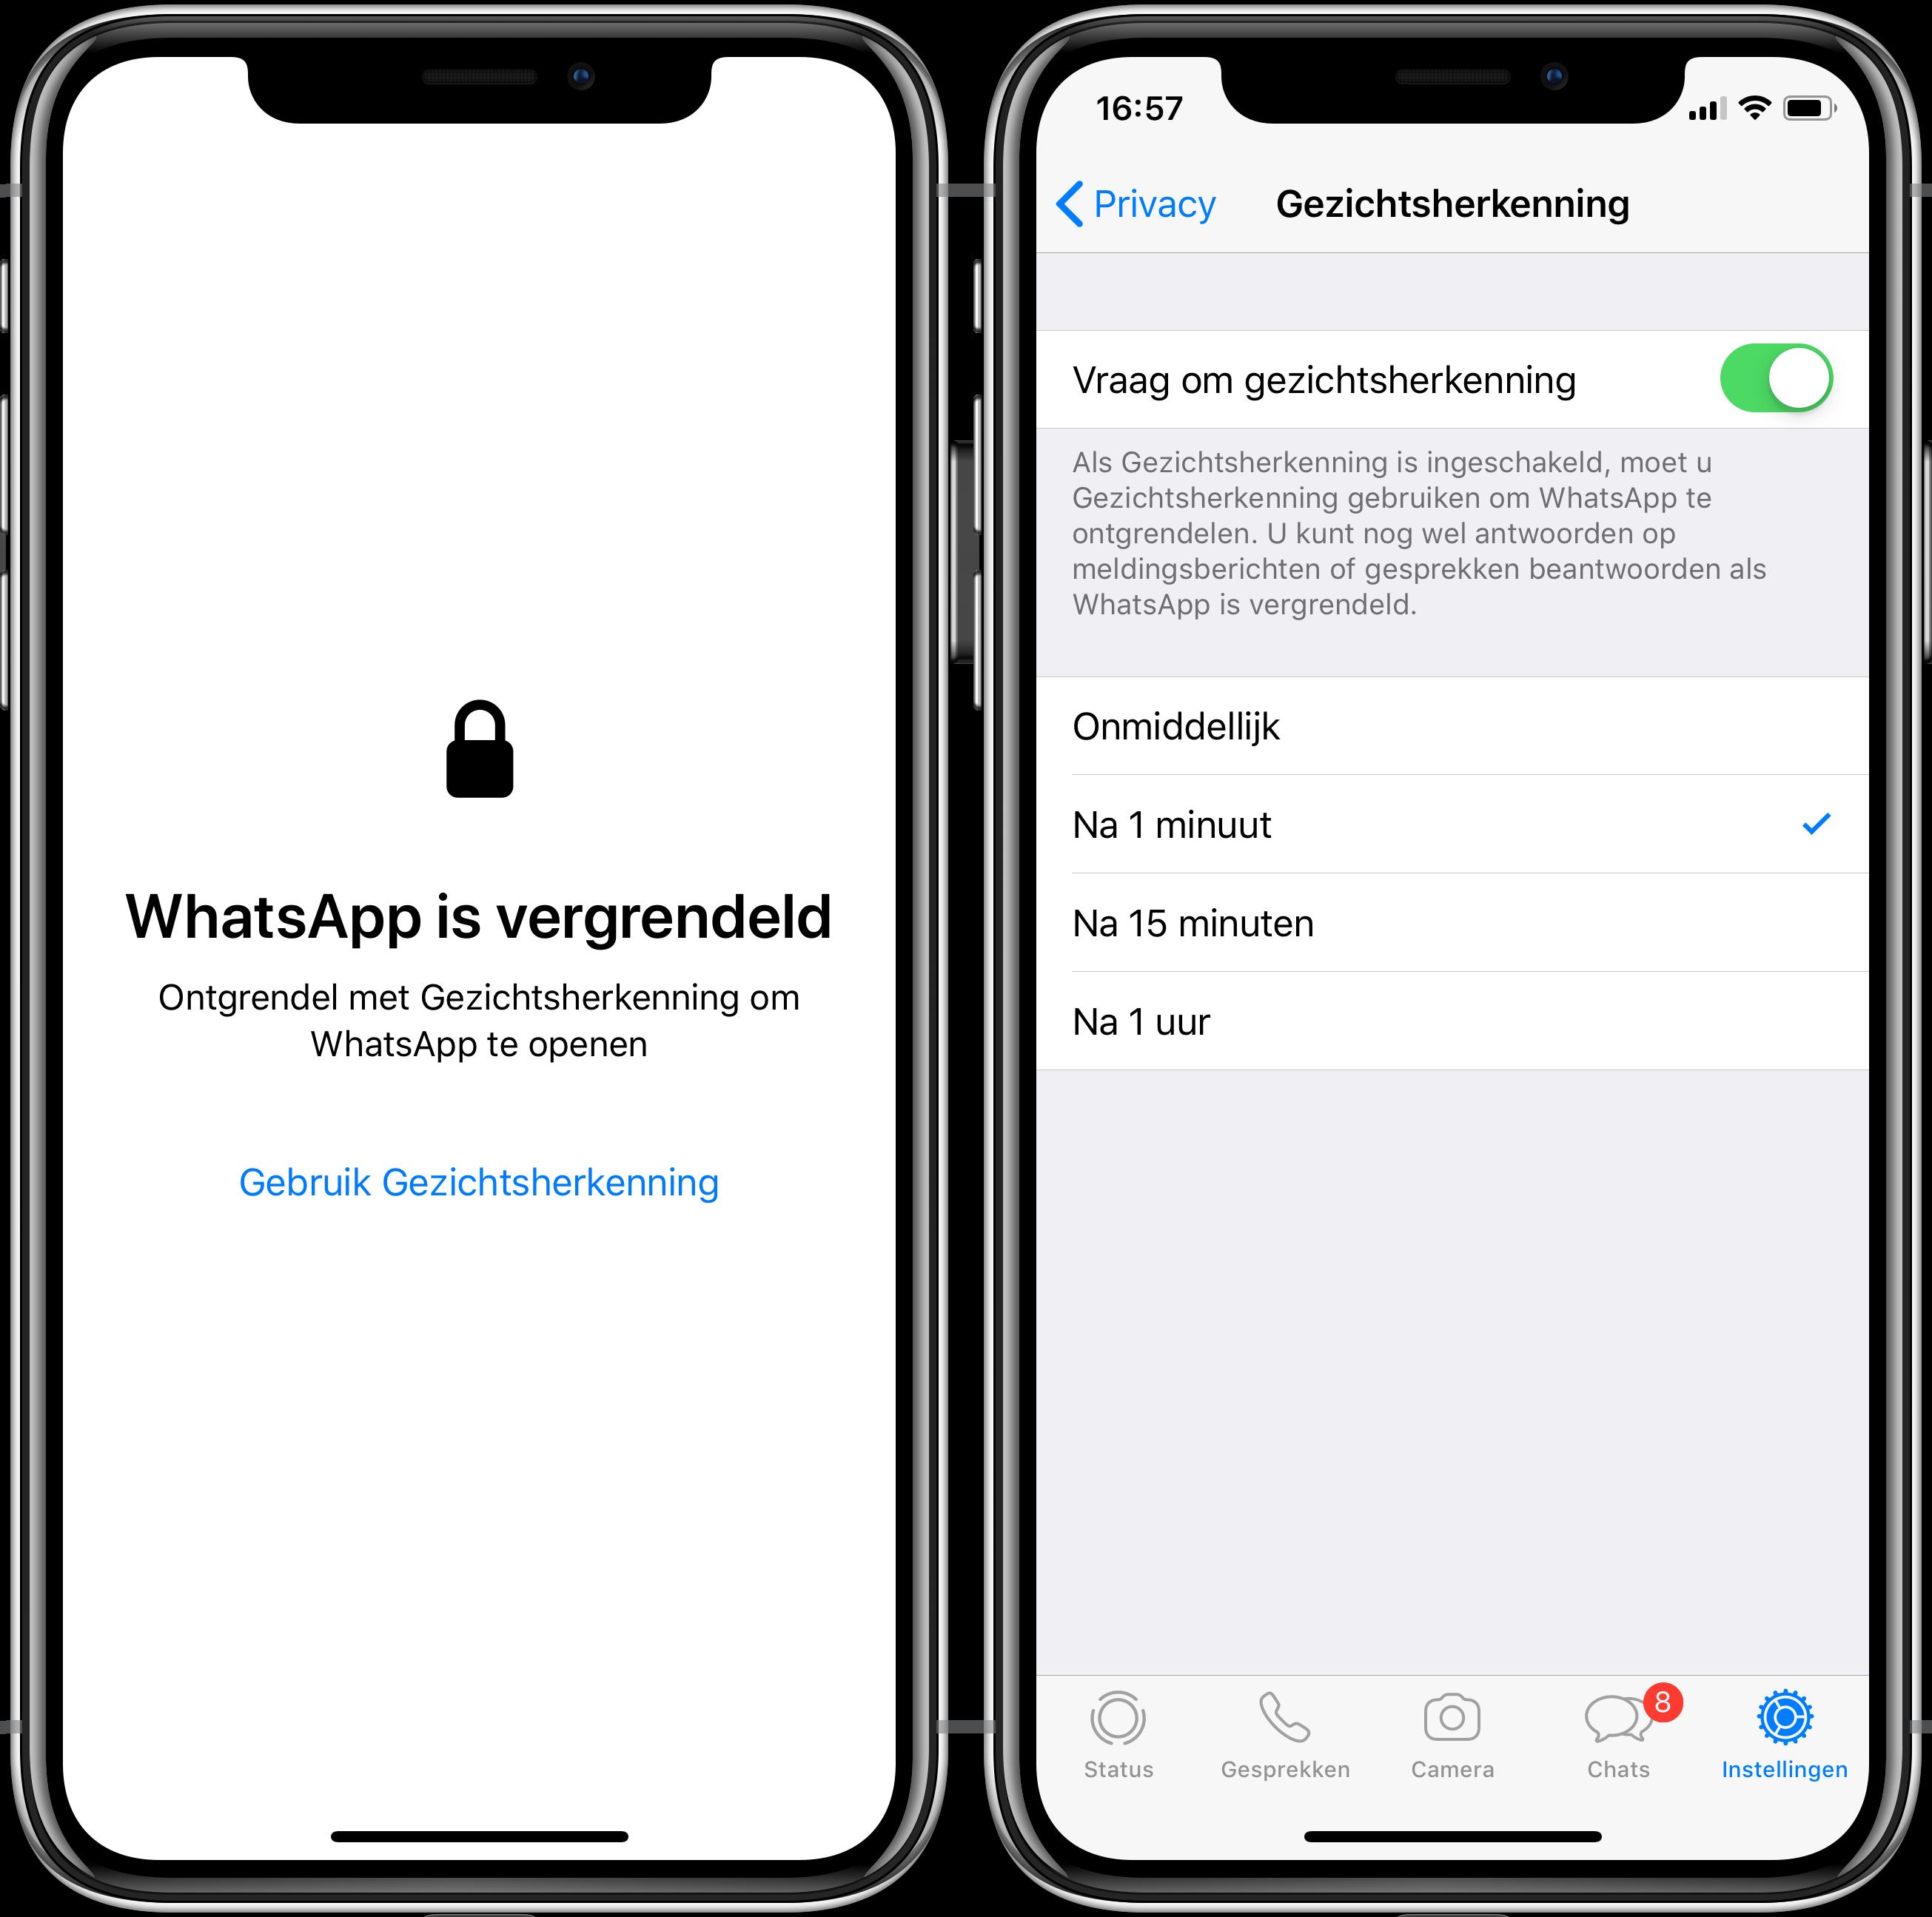 WhatsApp vergrendeld 001